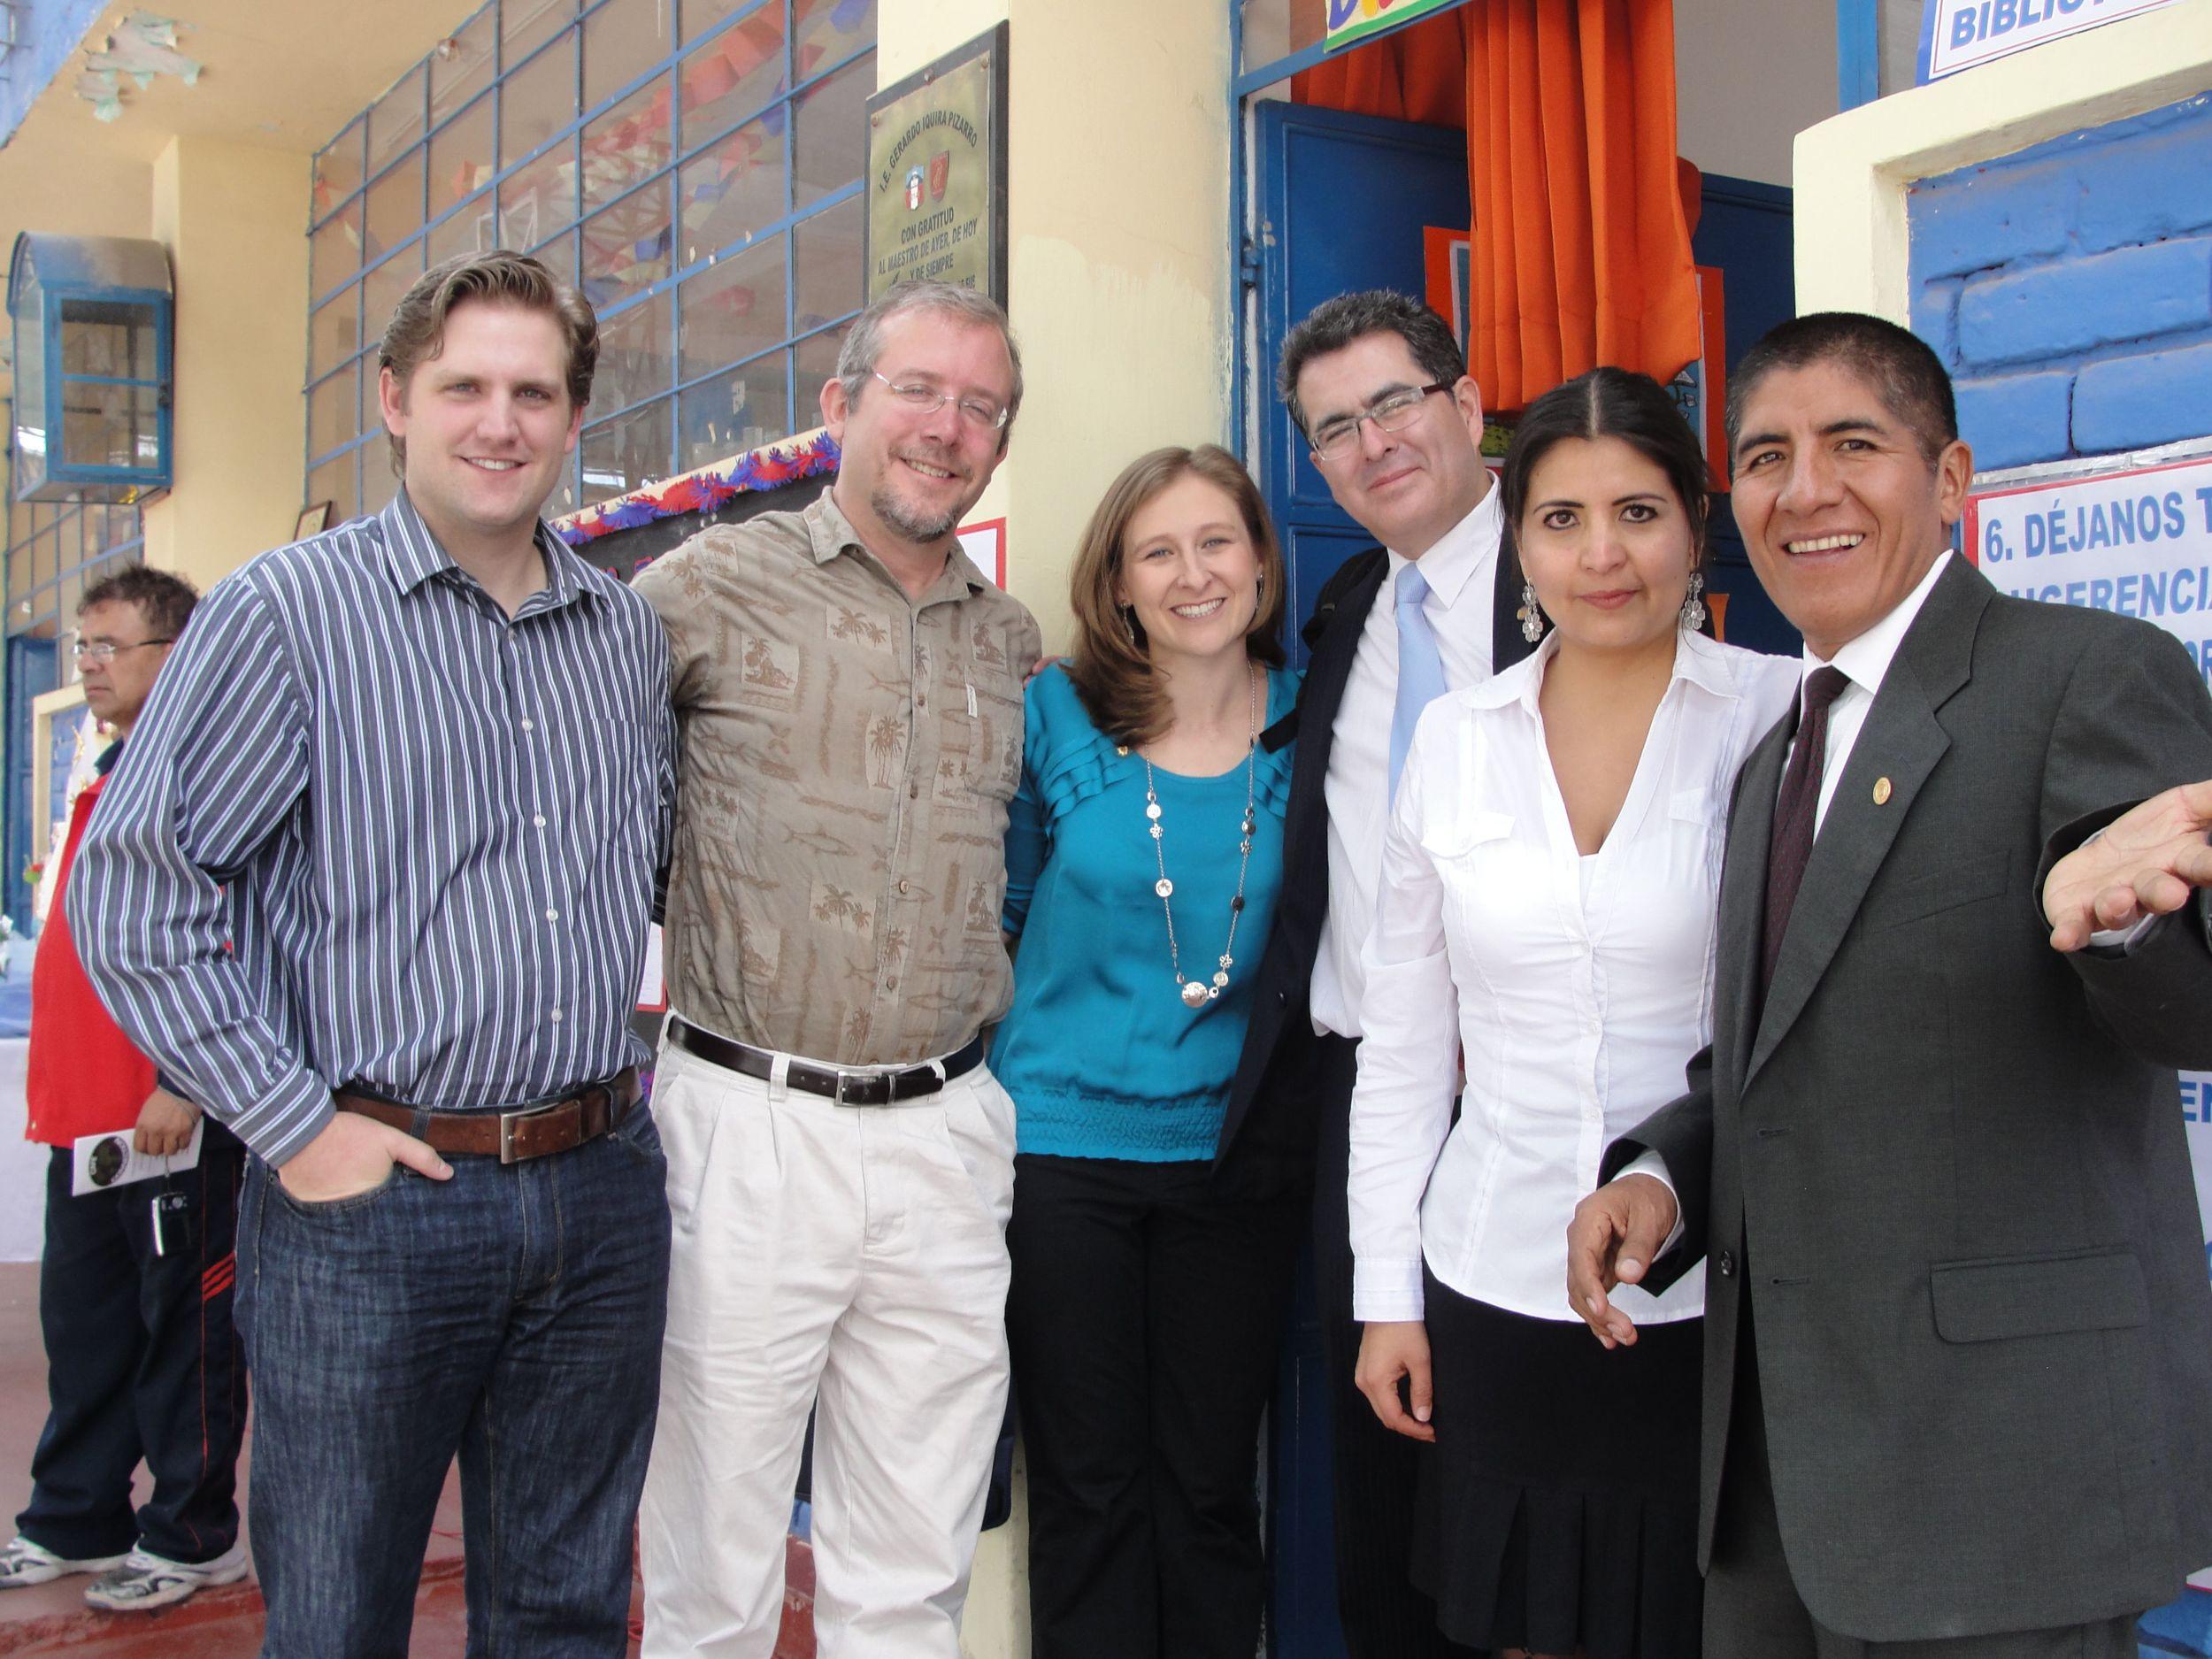 David Fann with the CUDA staff (Greg, David, Megan, Alfredo, Lucia, Abraham)